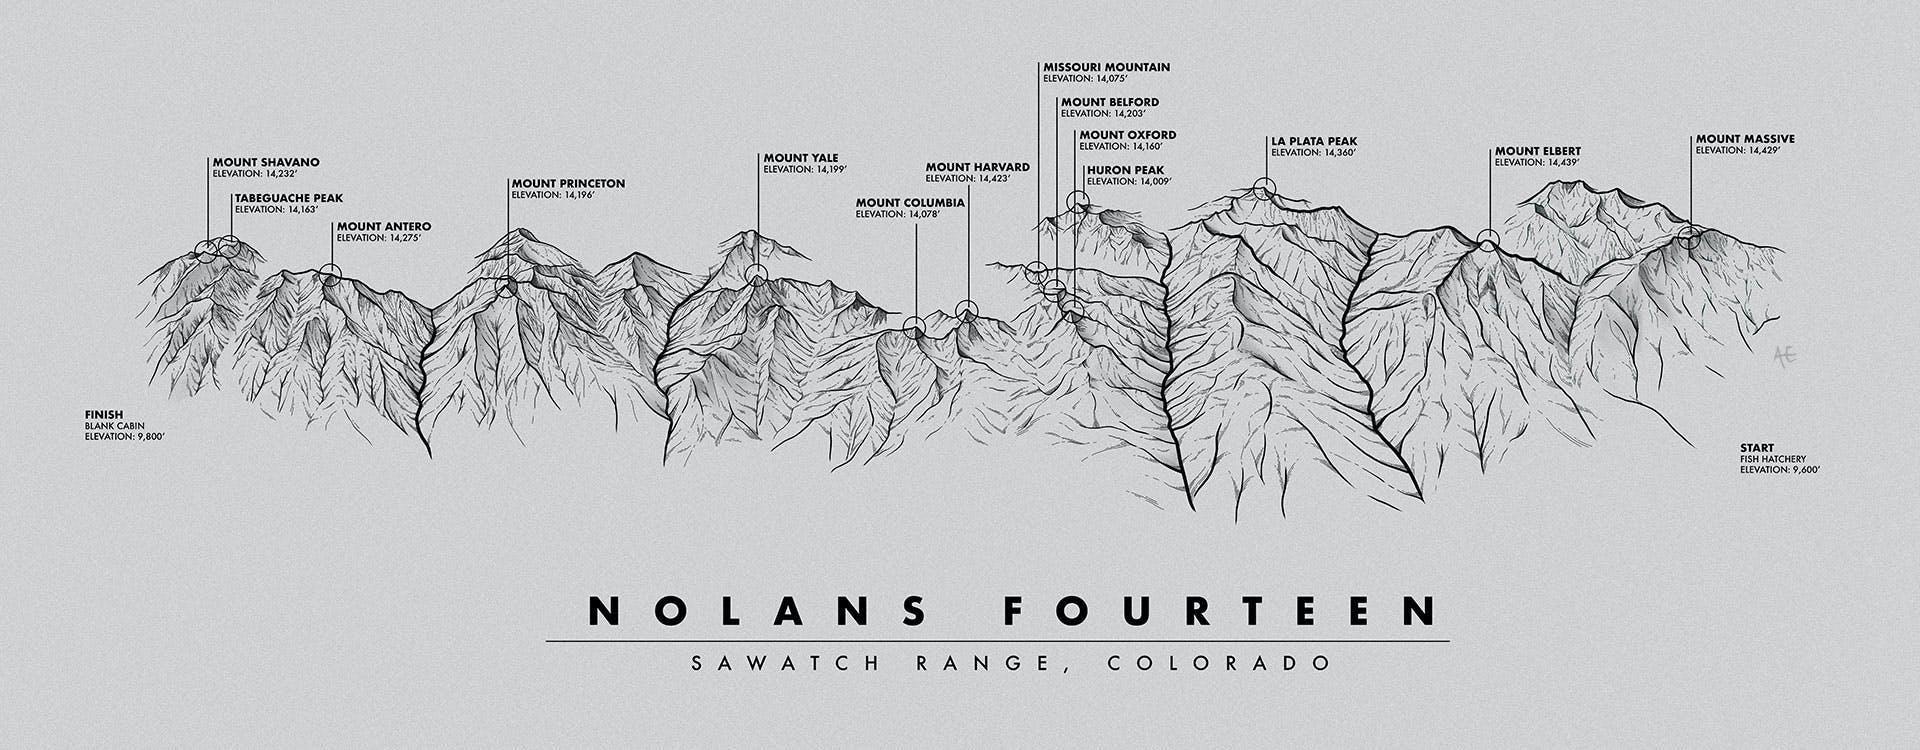 Sawatch Range Karte